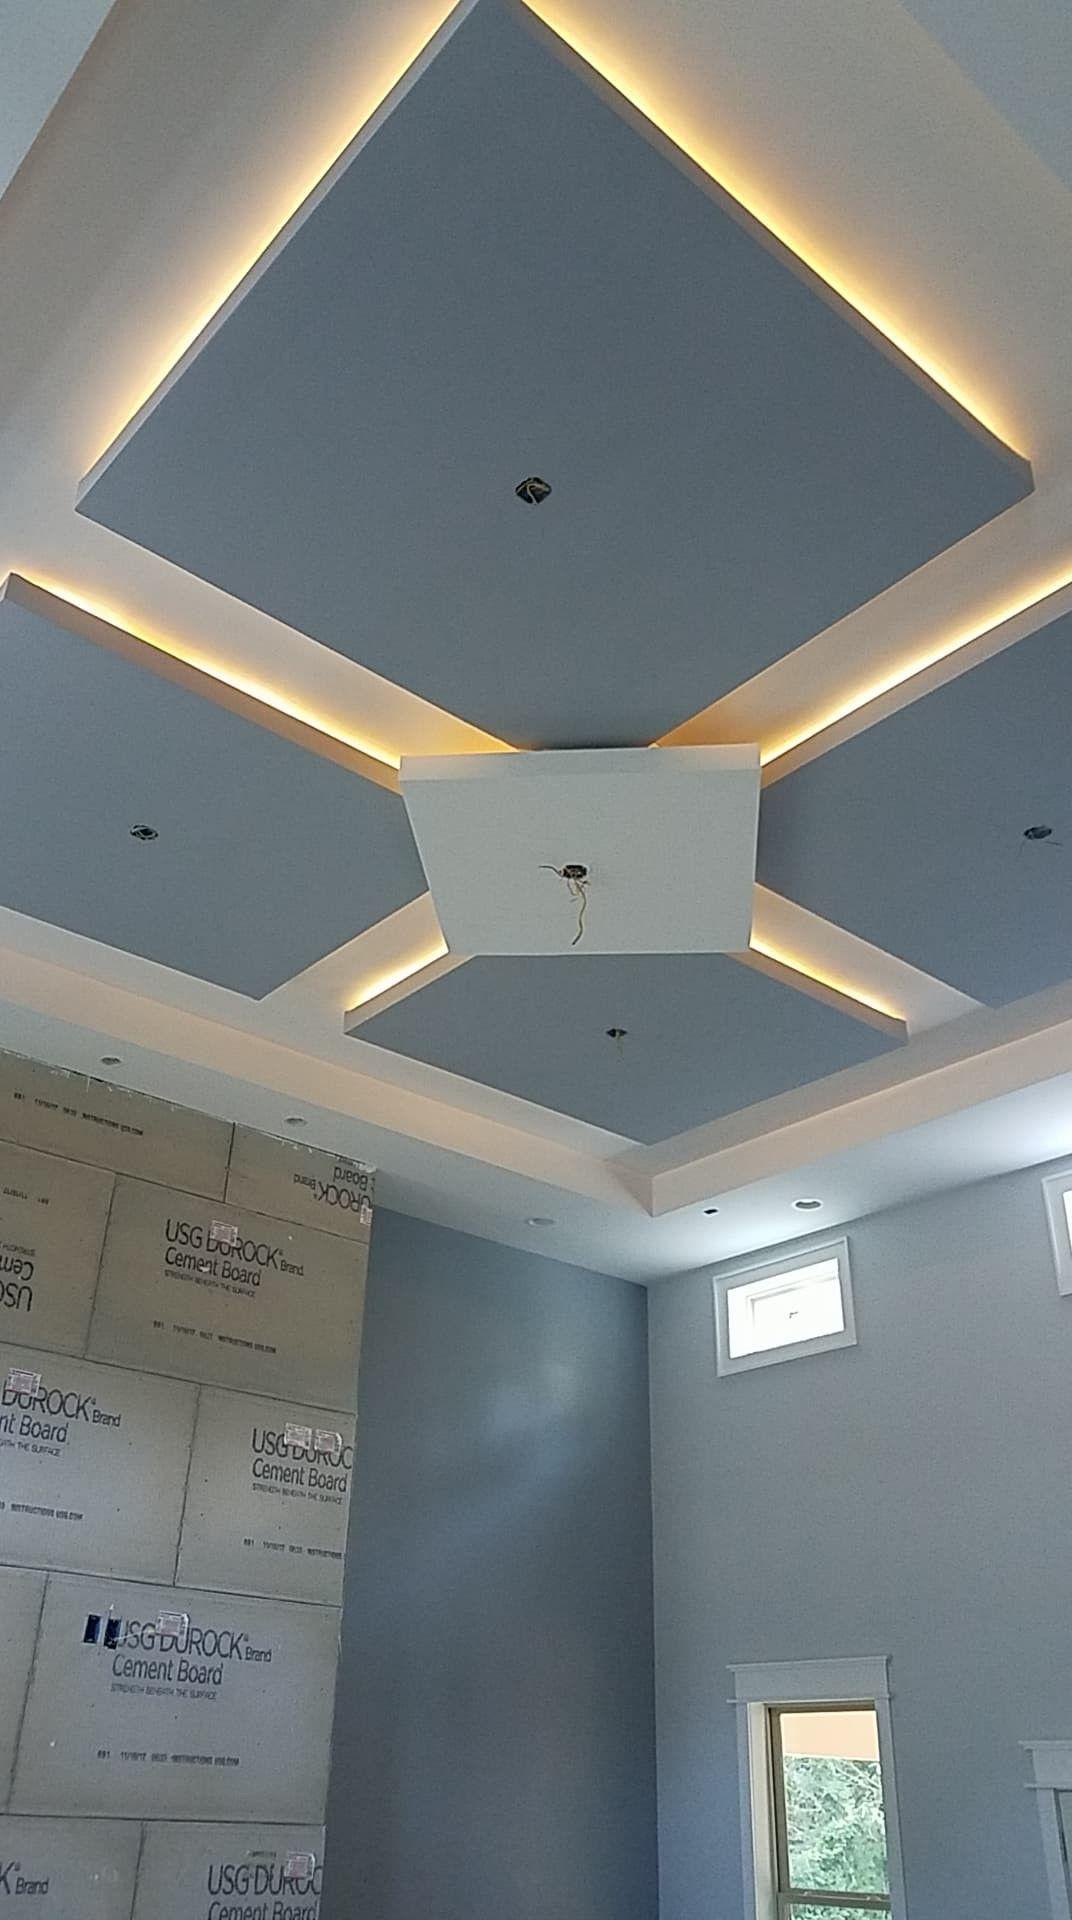 Kanauf Ceiling Design House Ceiling Design Ceiling Design Modern,Geometric Line Design Worksheets